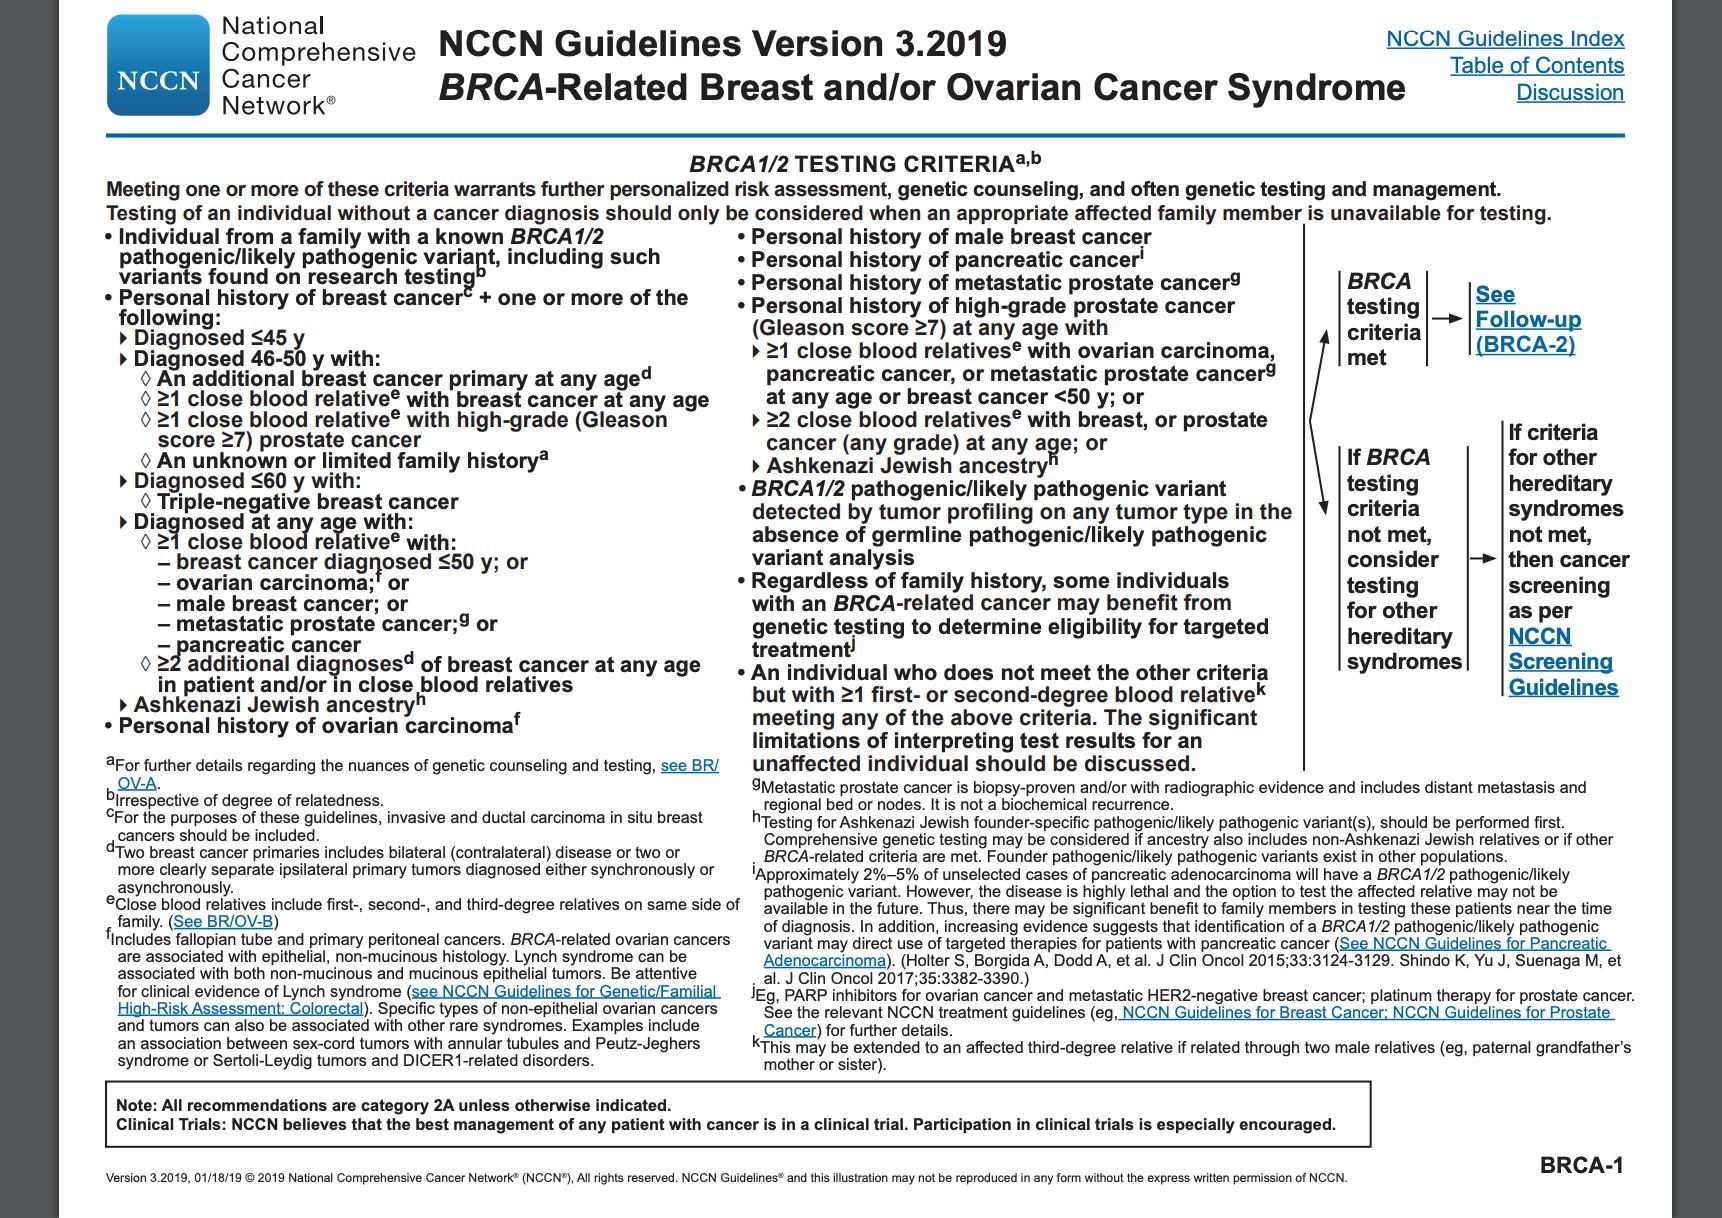 familial cancer risk assessment tool)